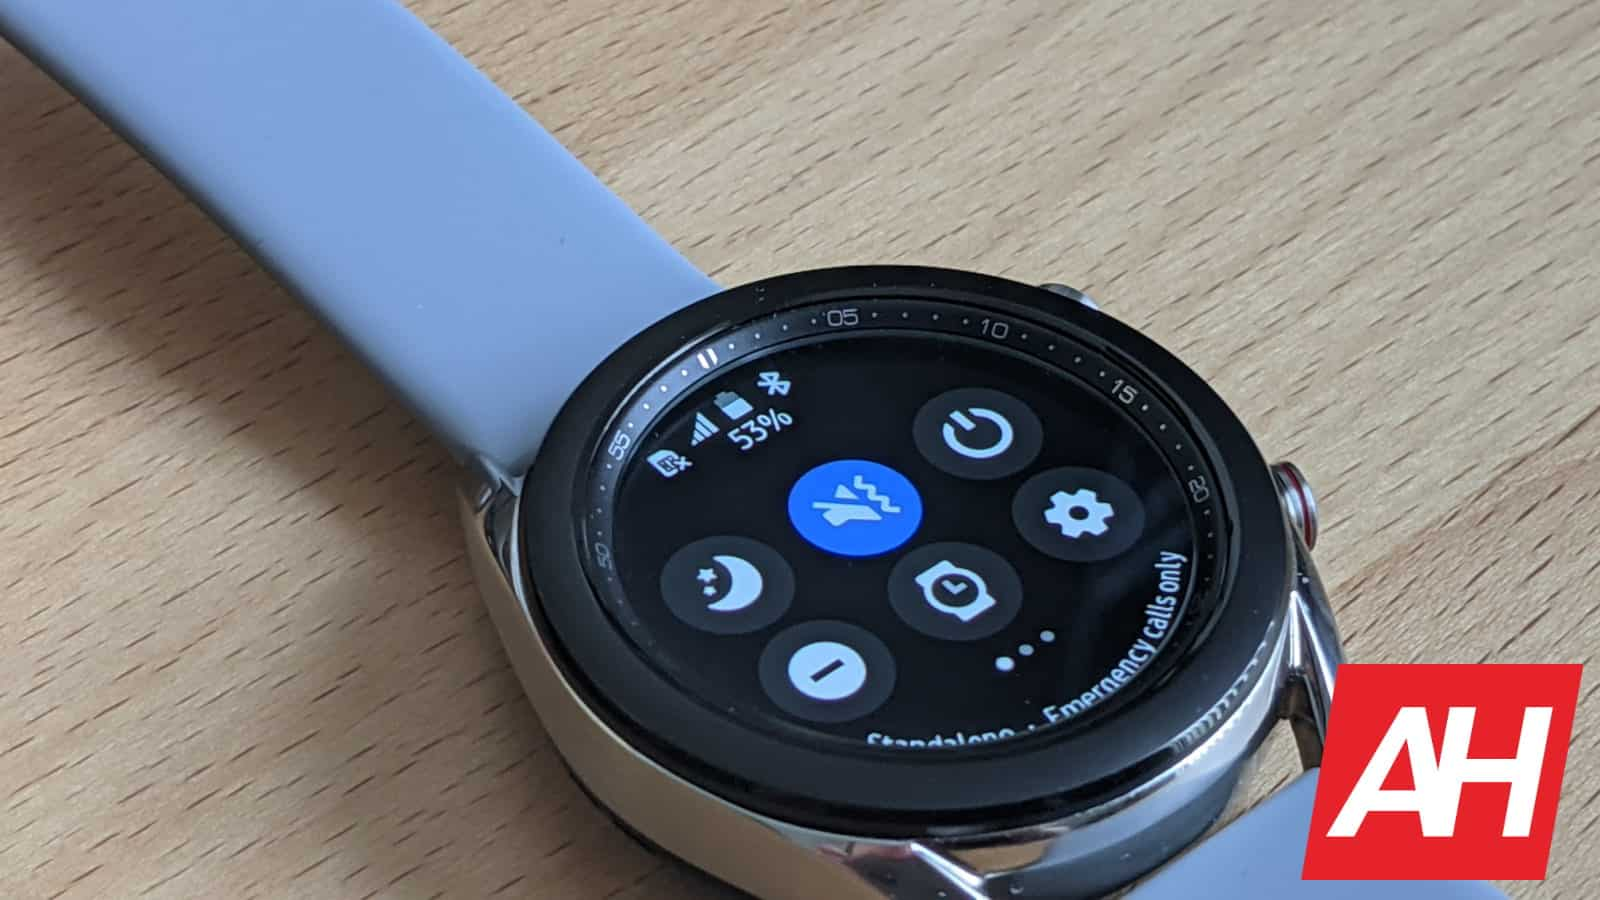 Samsung Galaxy Watch 3 Review 7